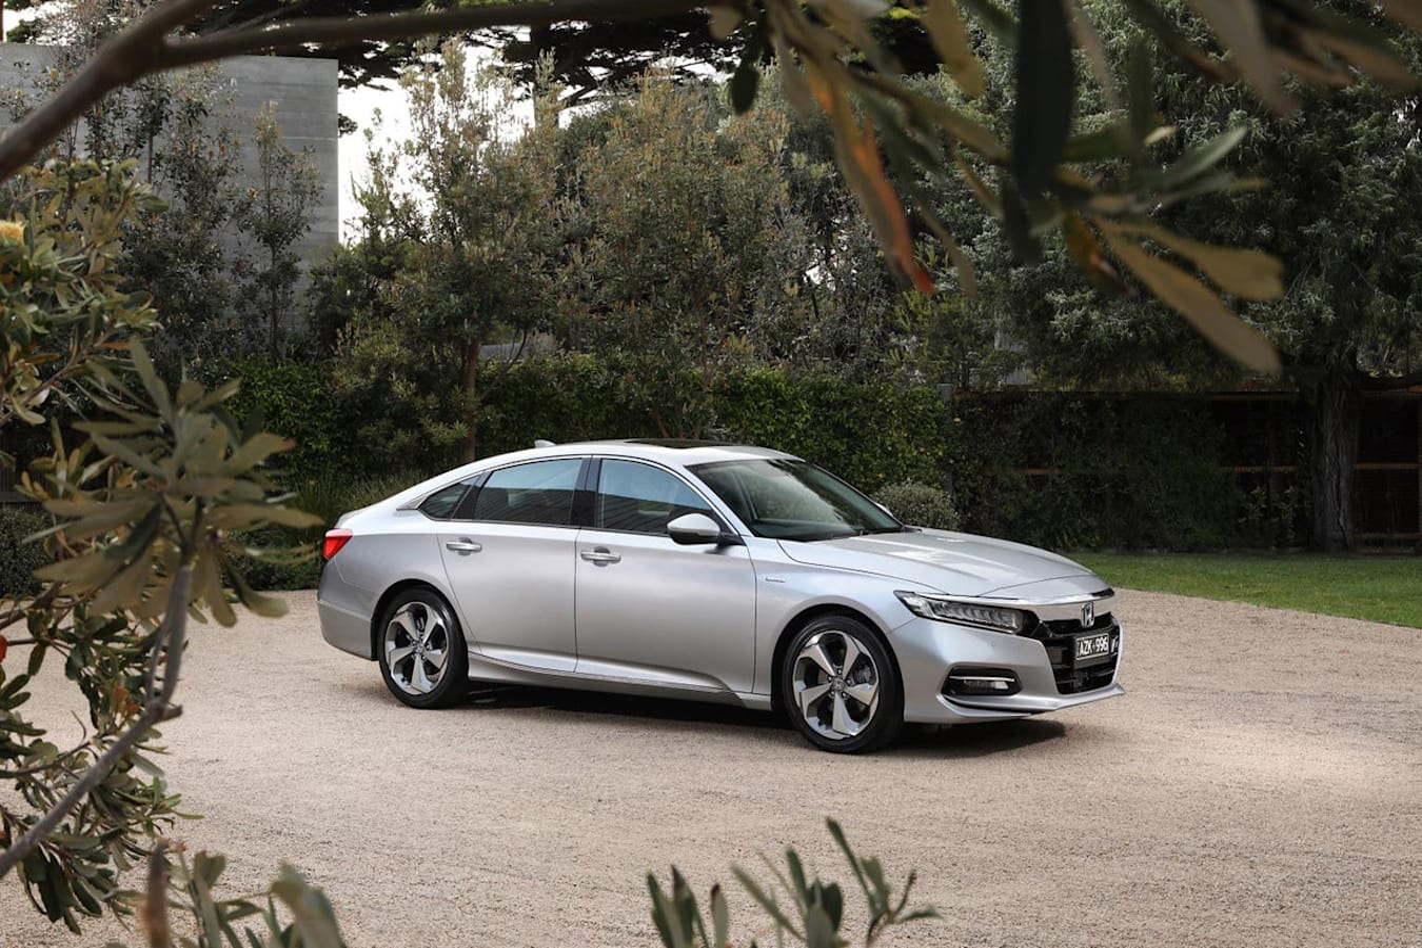 2020 Accord will be Honda's showroom flagship